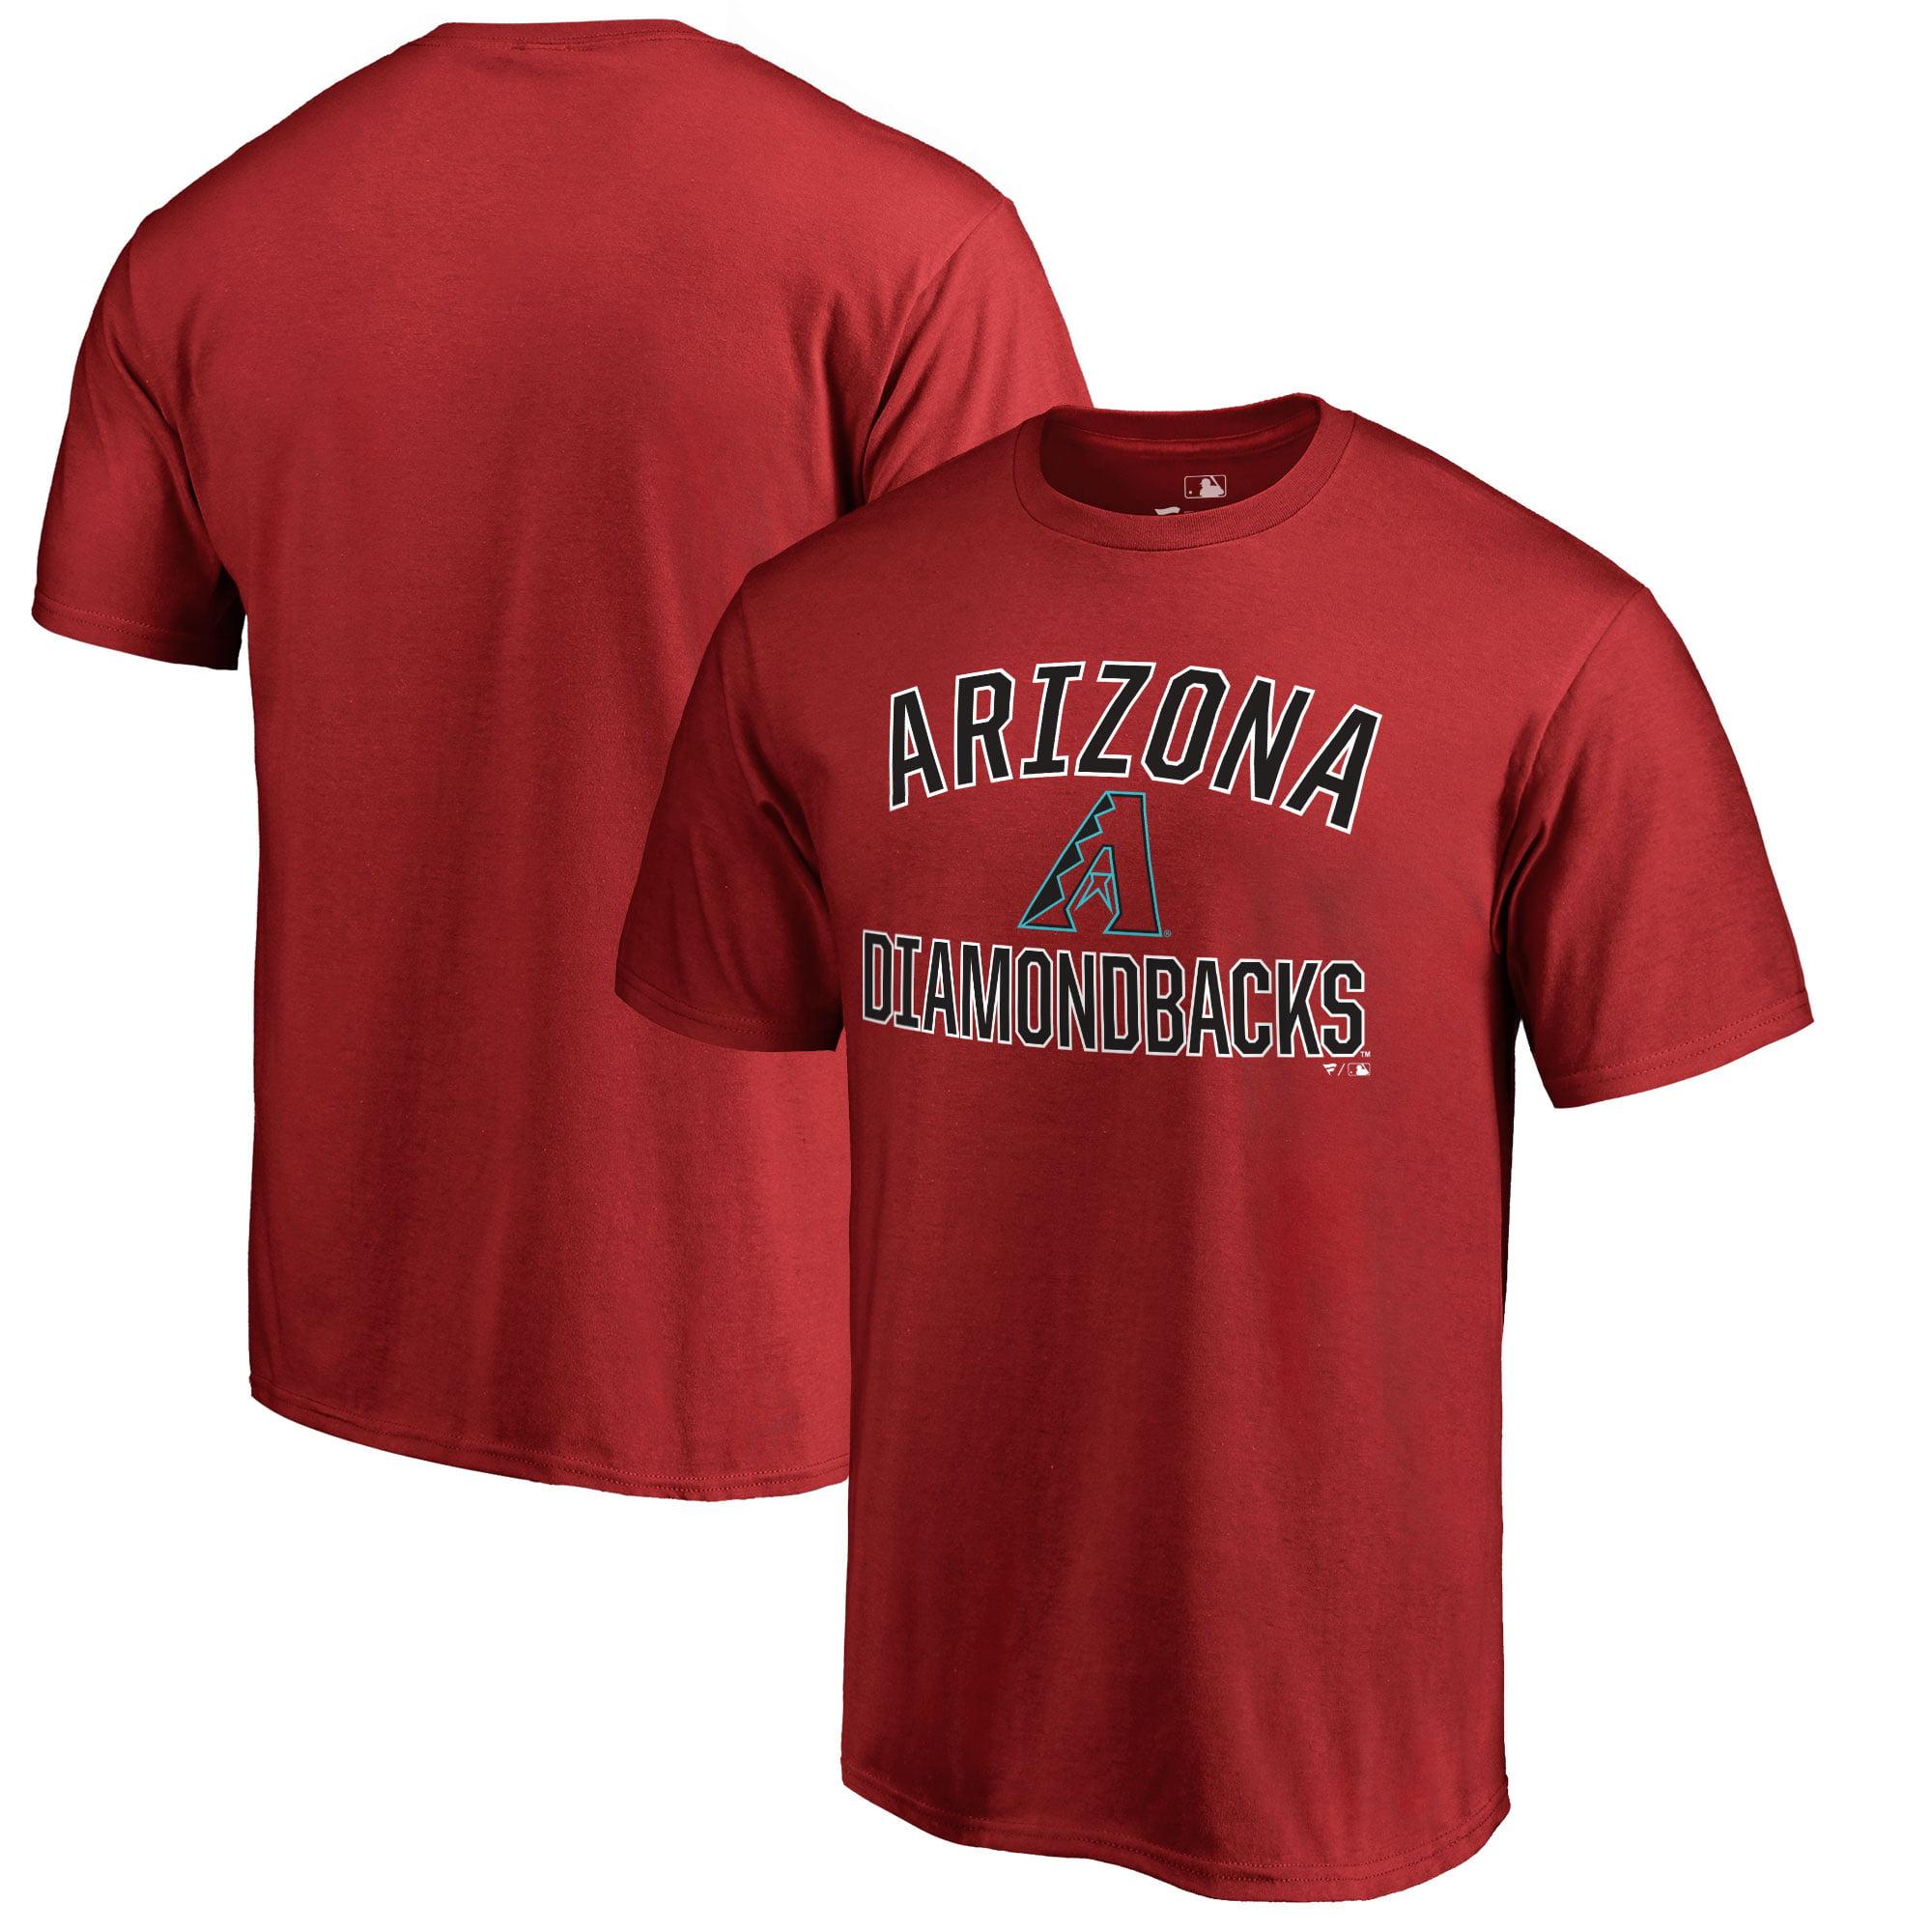 Arizona Diamondbacks Victory Arch Big & Tall T-Shirt - Red